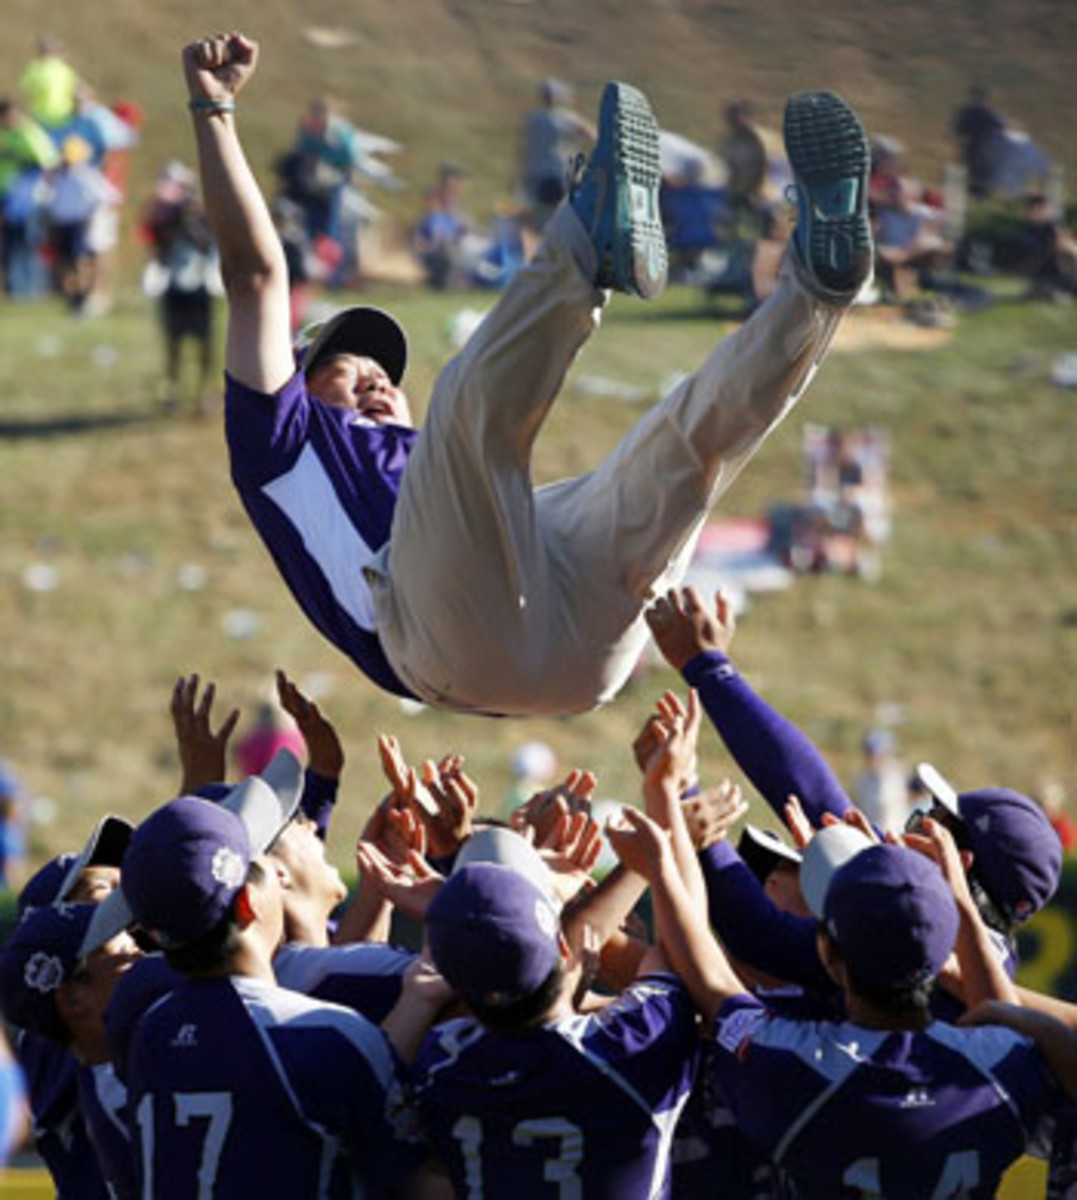 south korea wins 2014 little league world series